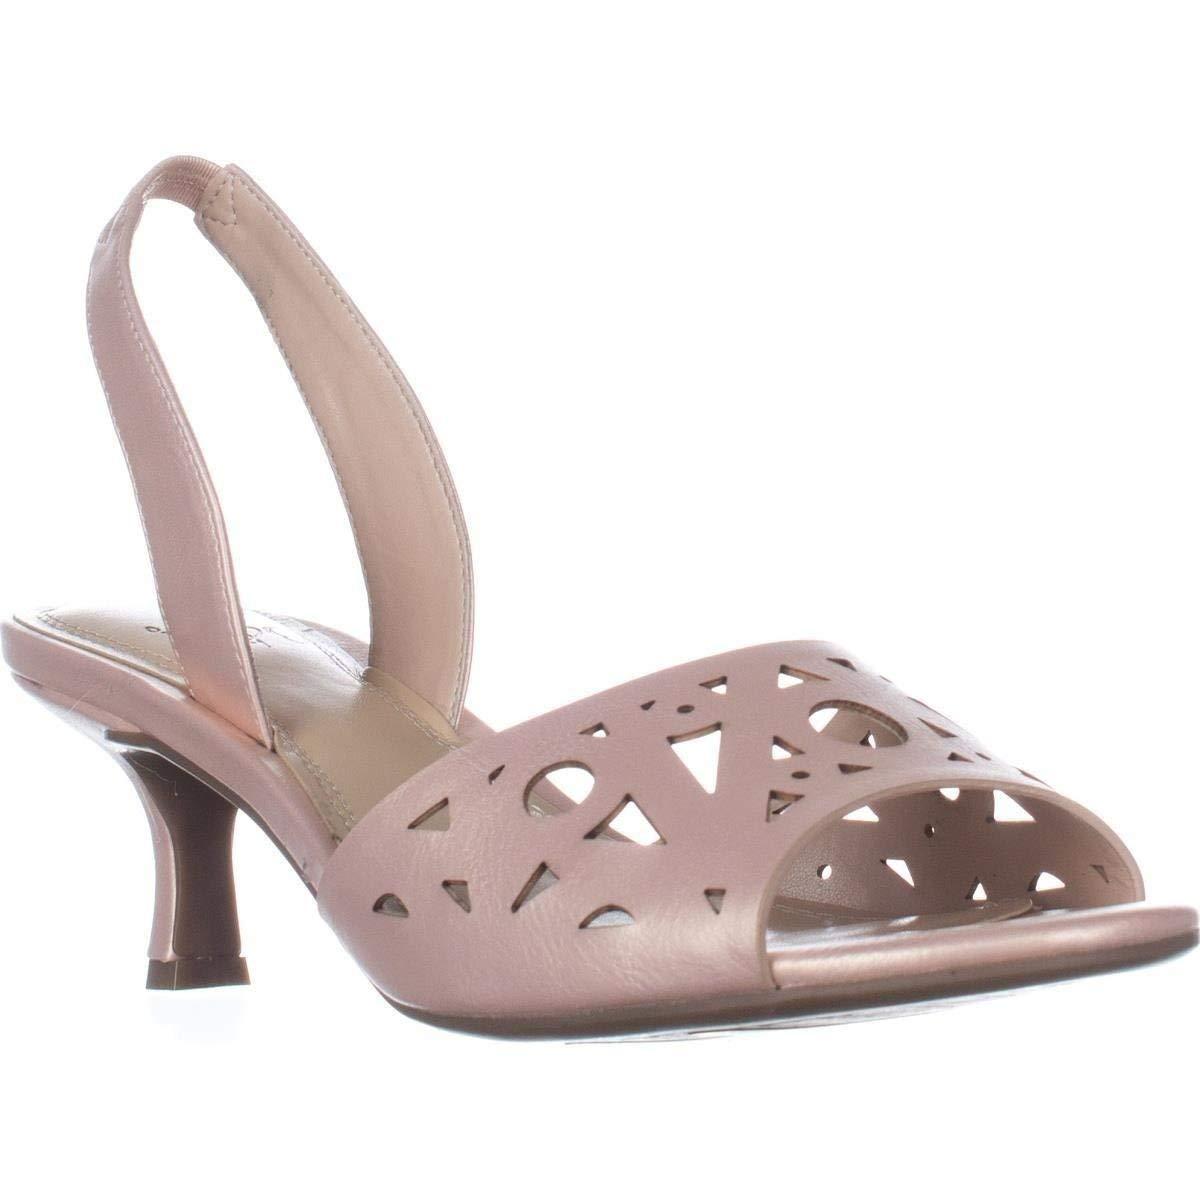 901bcd9d99b Amazon.com | Impo Womens Elol Open Toe Casual Slingback Sandals ...